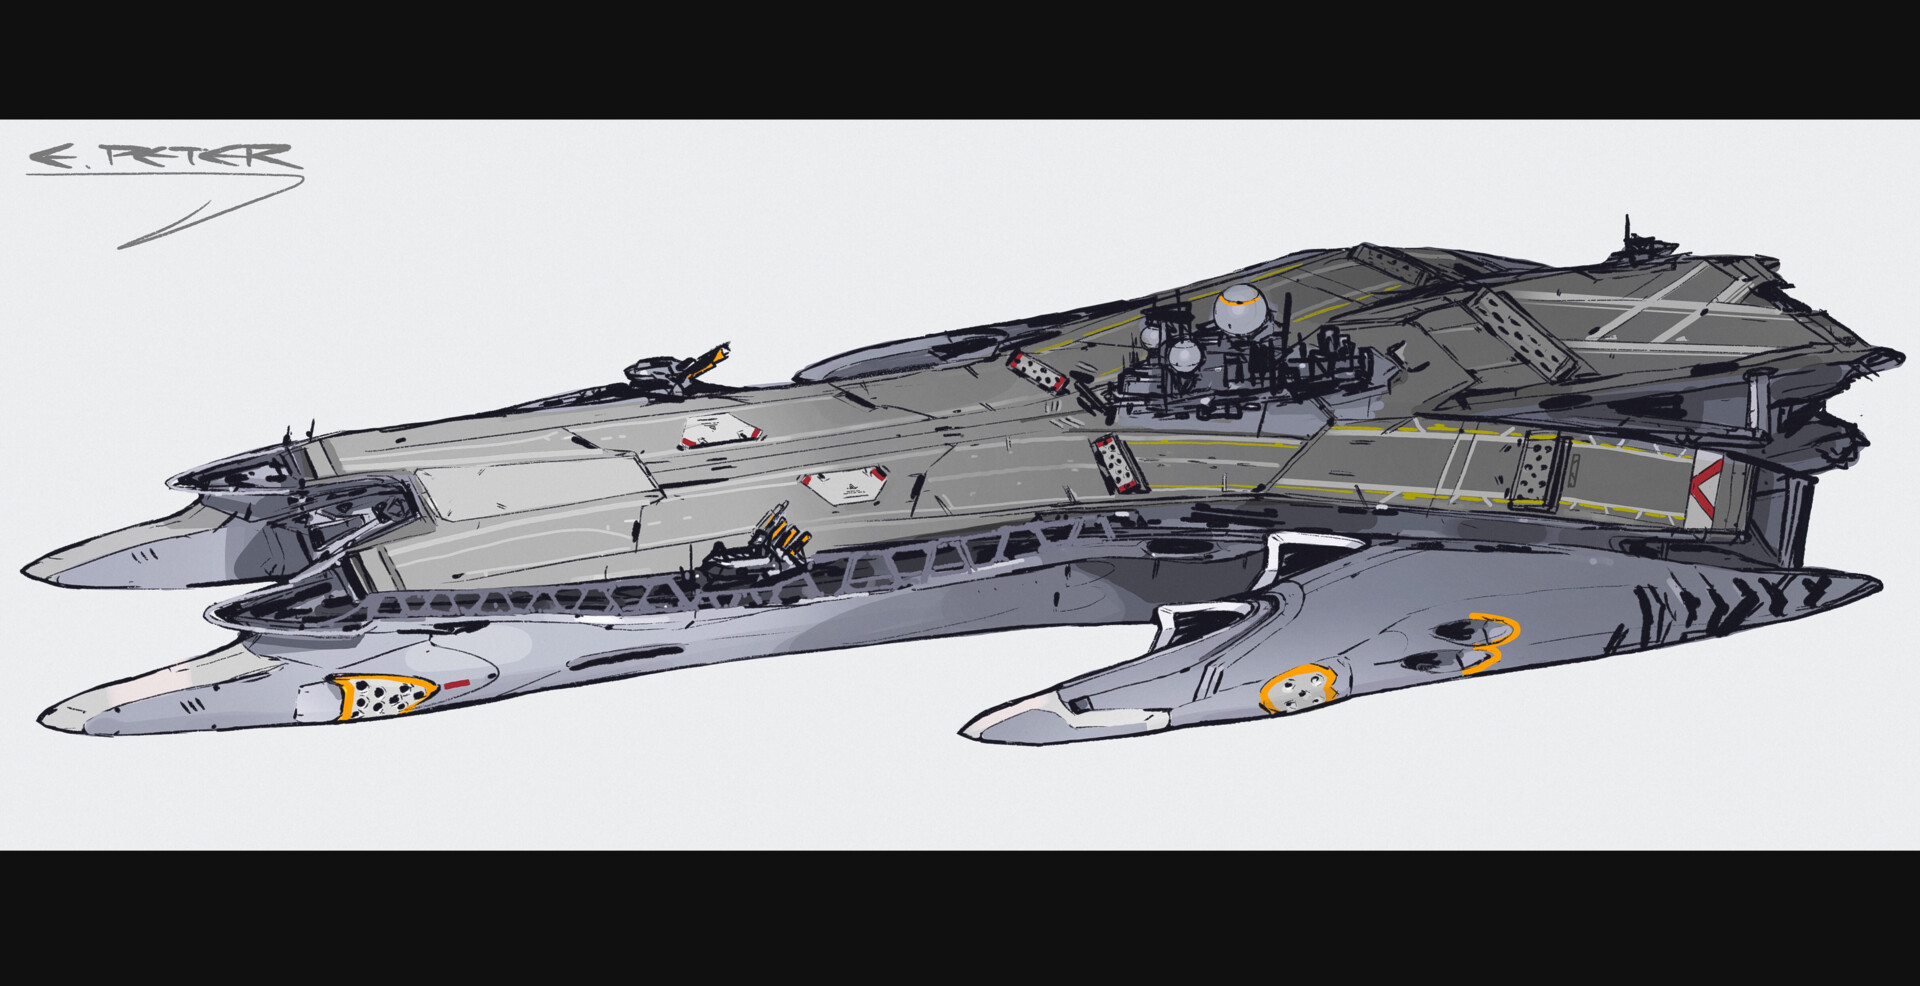 West aircraft carrier (L)